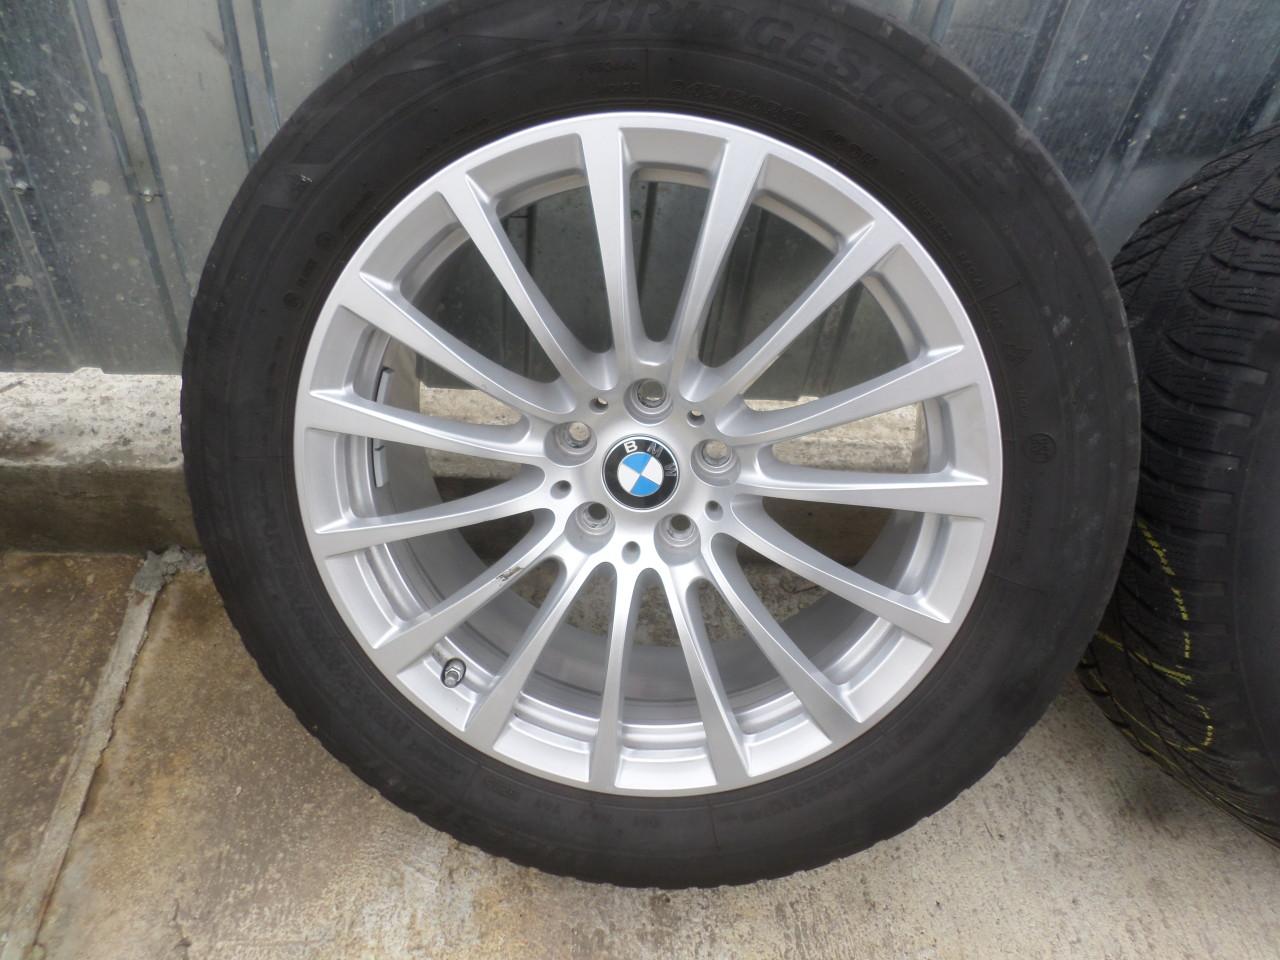 Jante originale BMW 18 seria 5 G30 seria 7 G11 G12  STYLE 619 +SENZORI